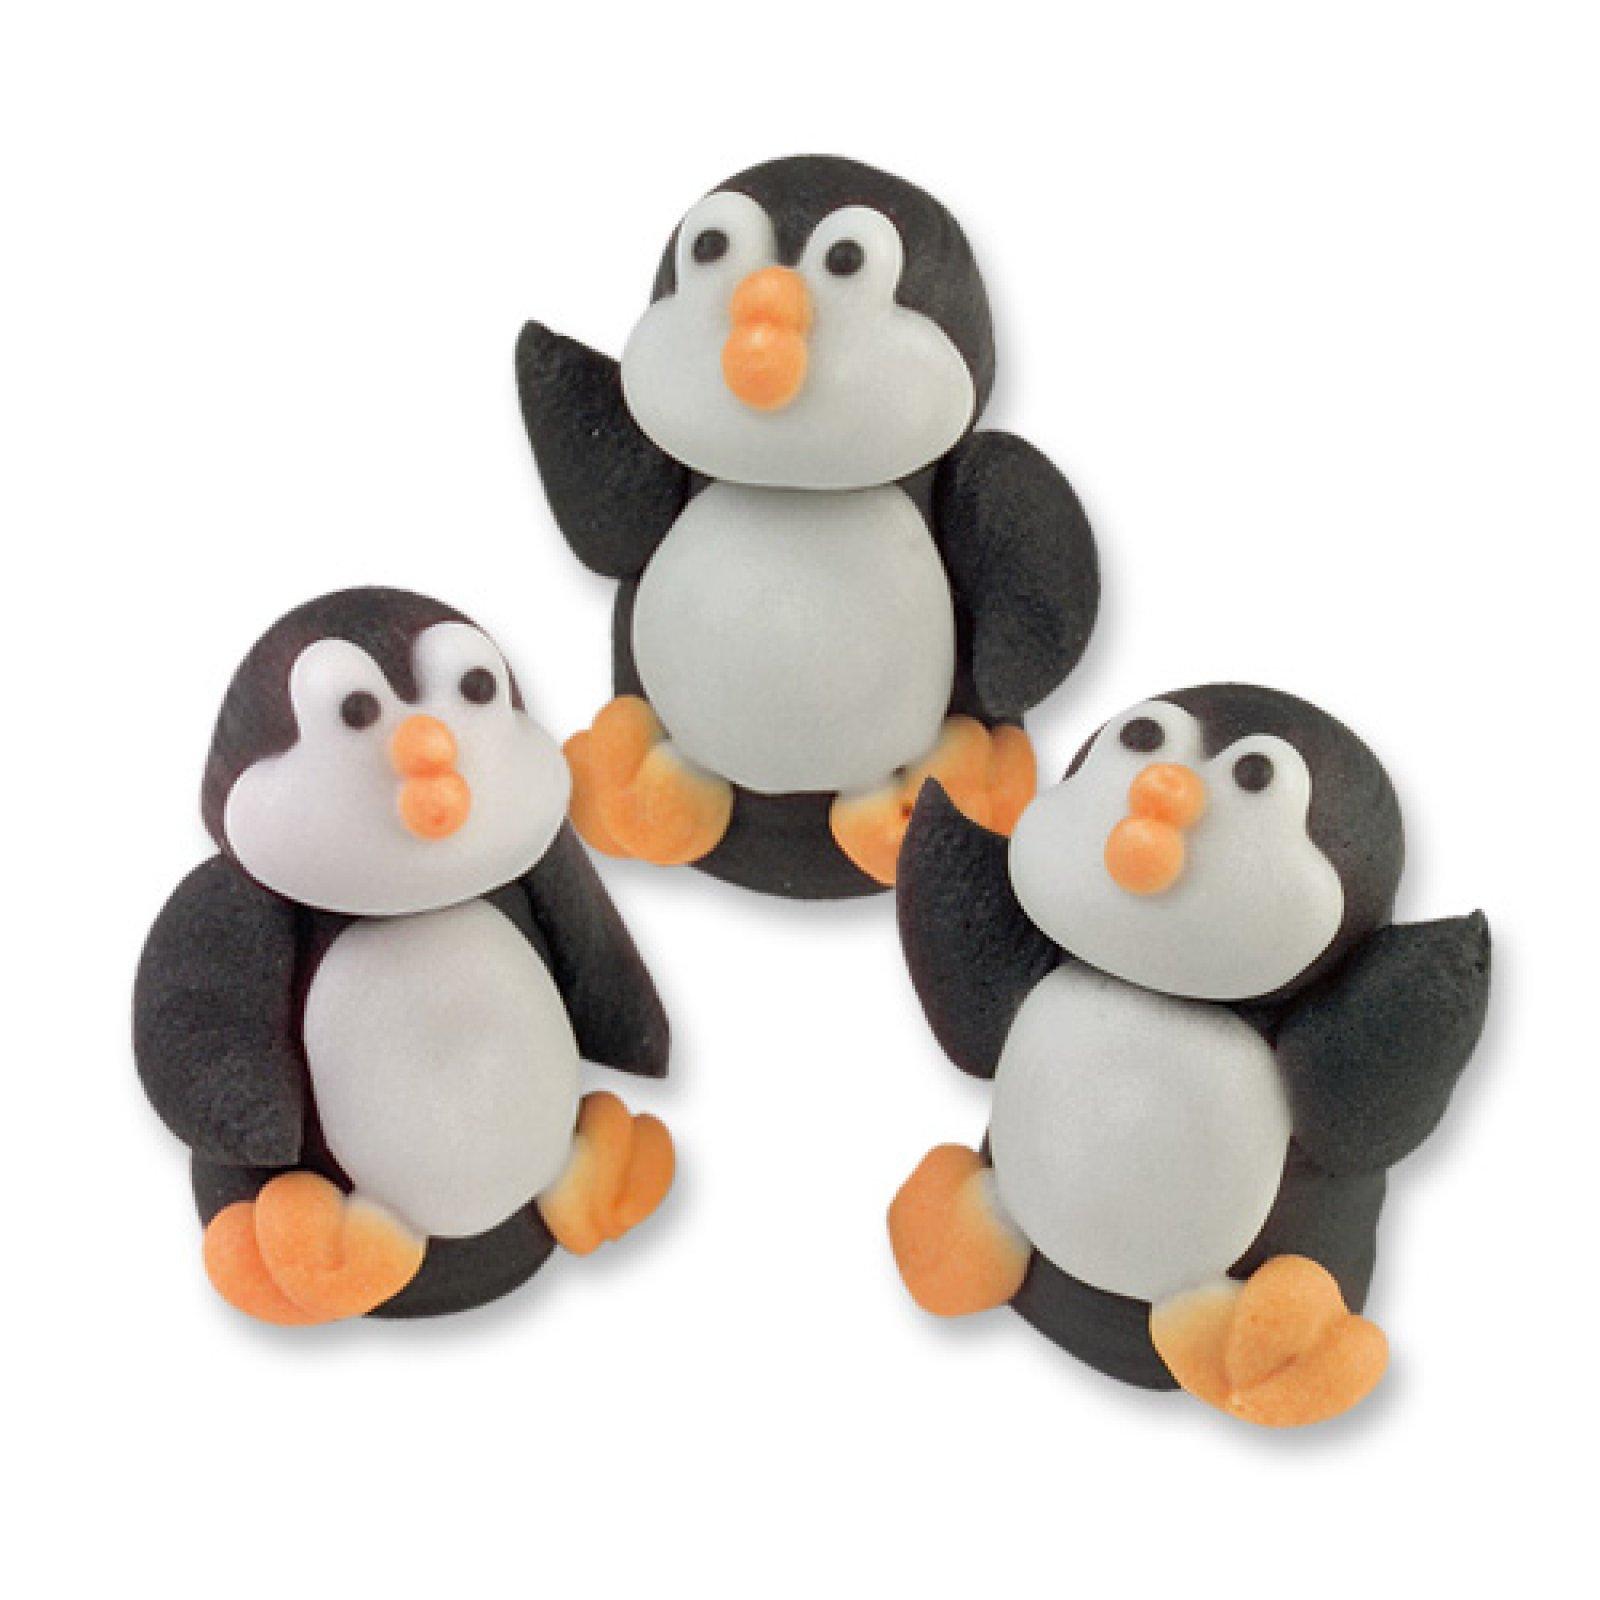 pinguin zuckerfiguren f r cupcakes der ideen. Black Bedroom Furniture Sets. Home Design Ideas